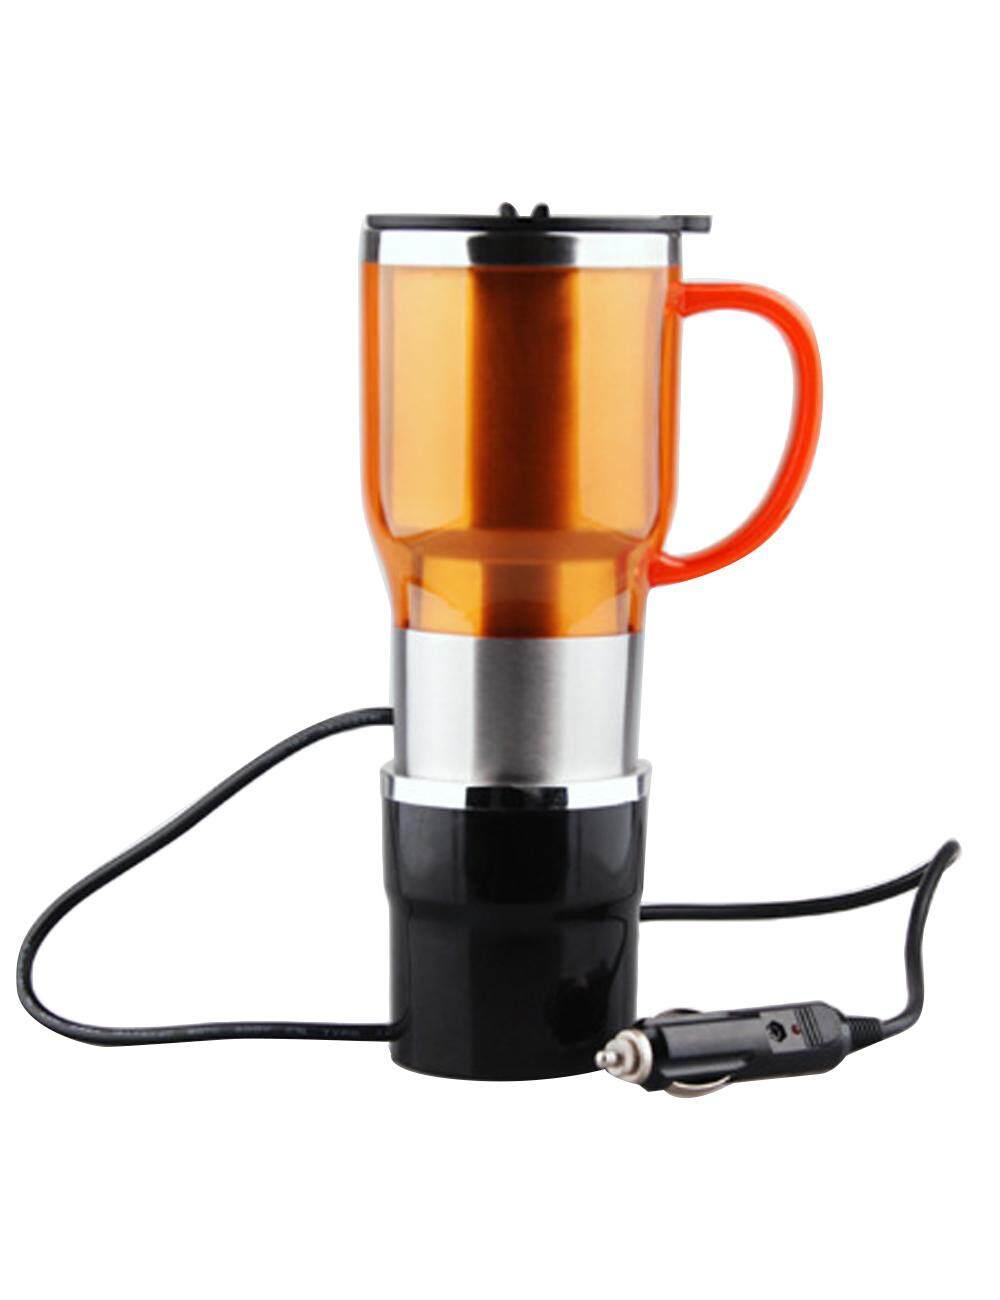 Fitur Cukke 12v 24v 450ml Electric Heating Cup Driving Travel Q2 11cm Teko Listrik Mug Pemanas Fashion Vacuum Stainless Steel Bottle